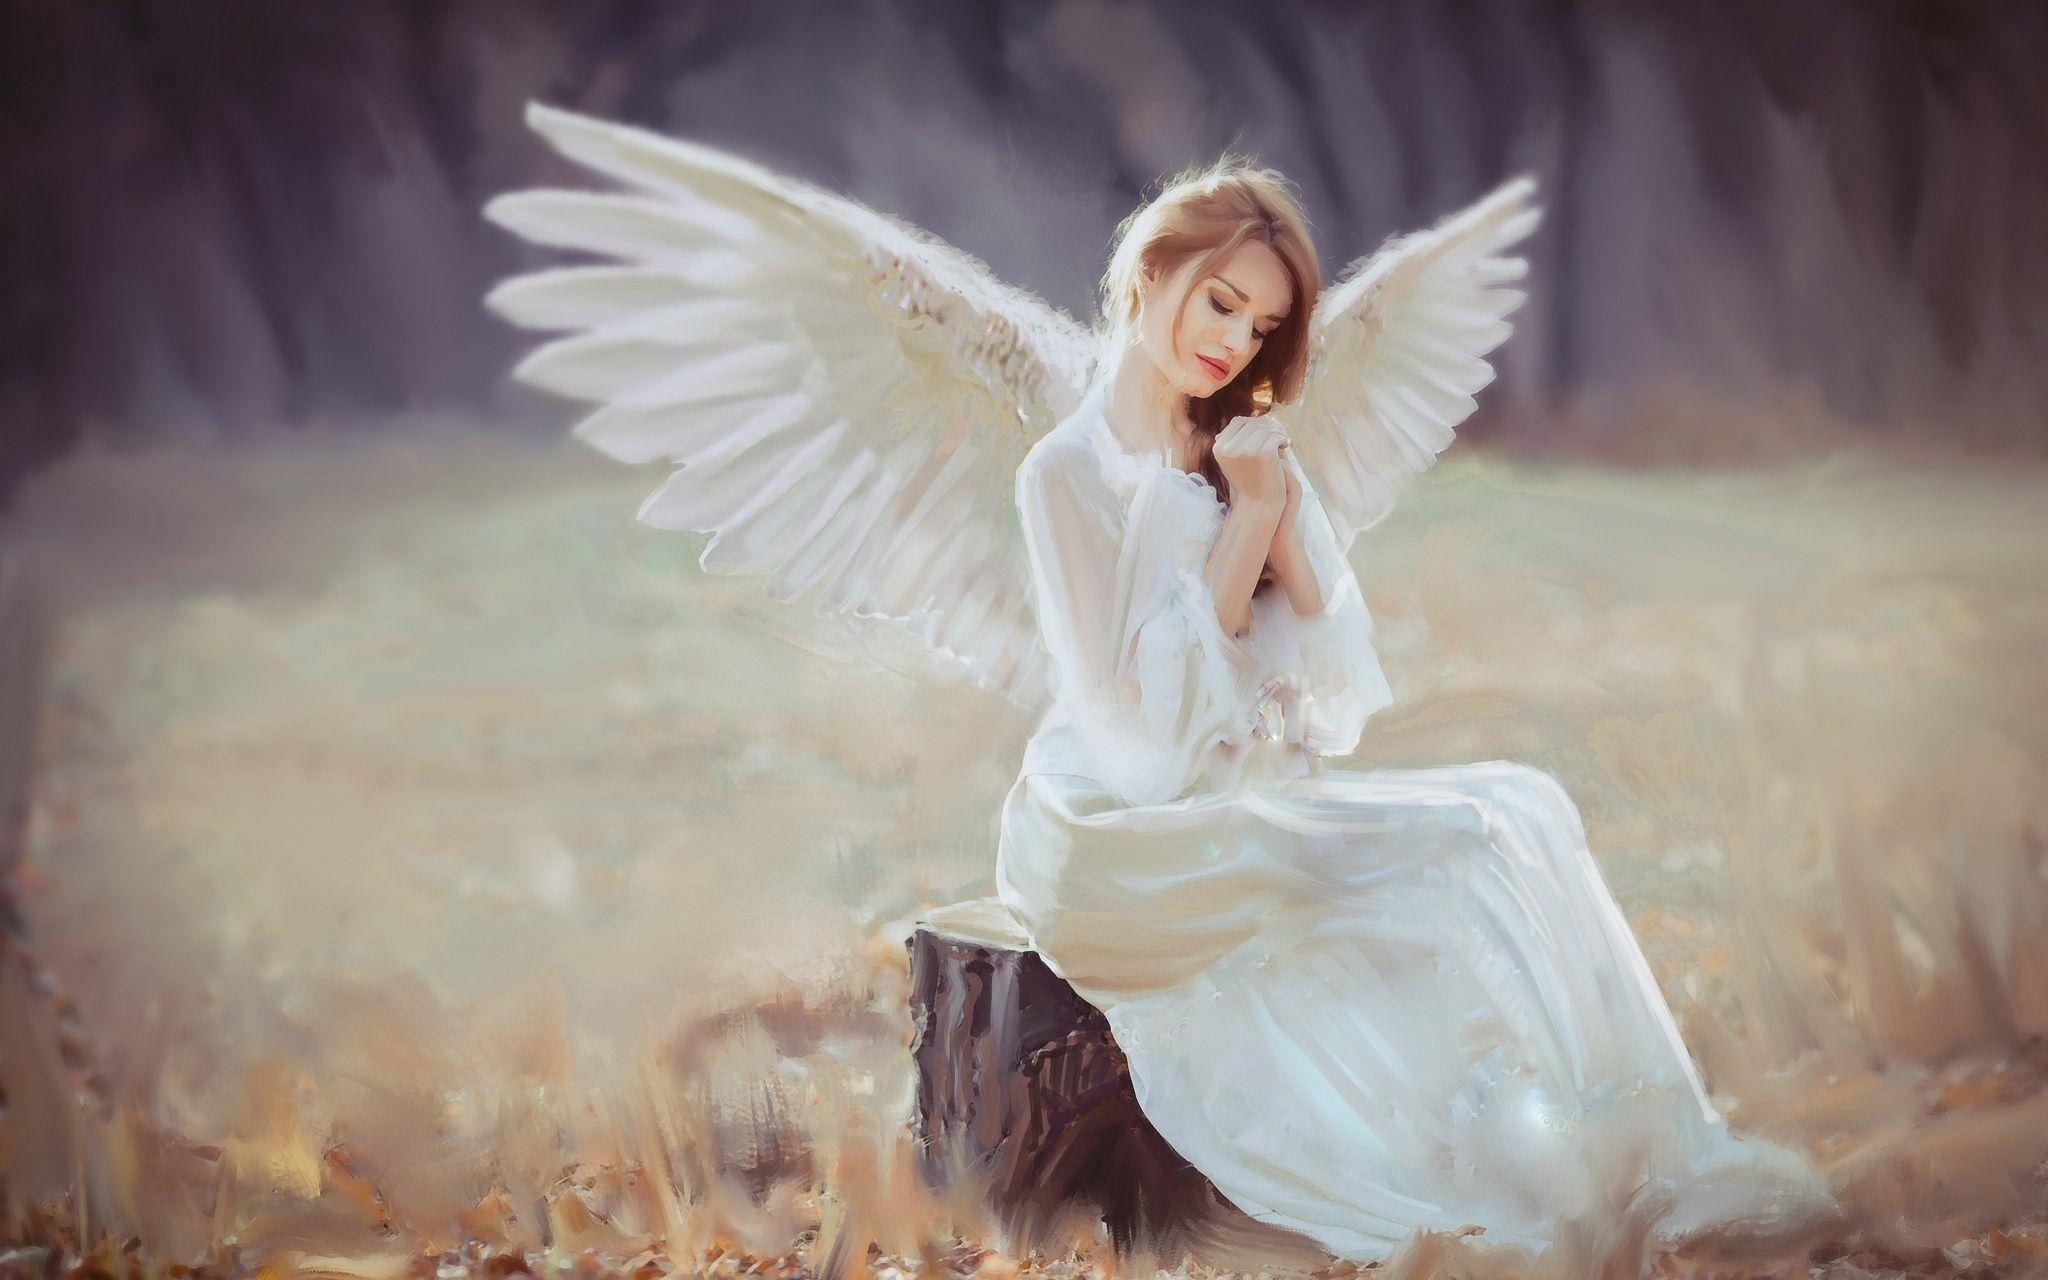 Angel Girl Wallpapers Top Free Angel Girl Backgrounds